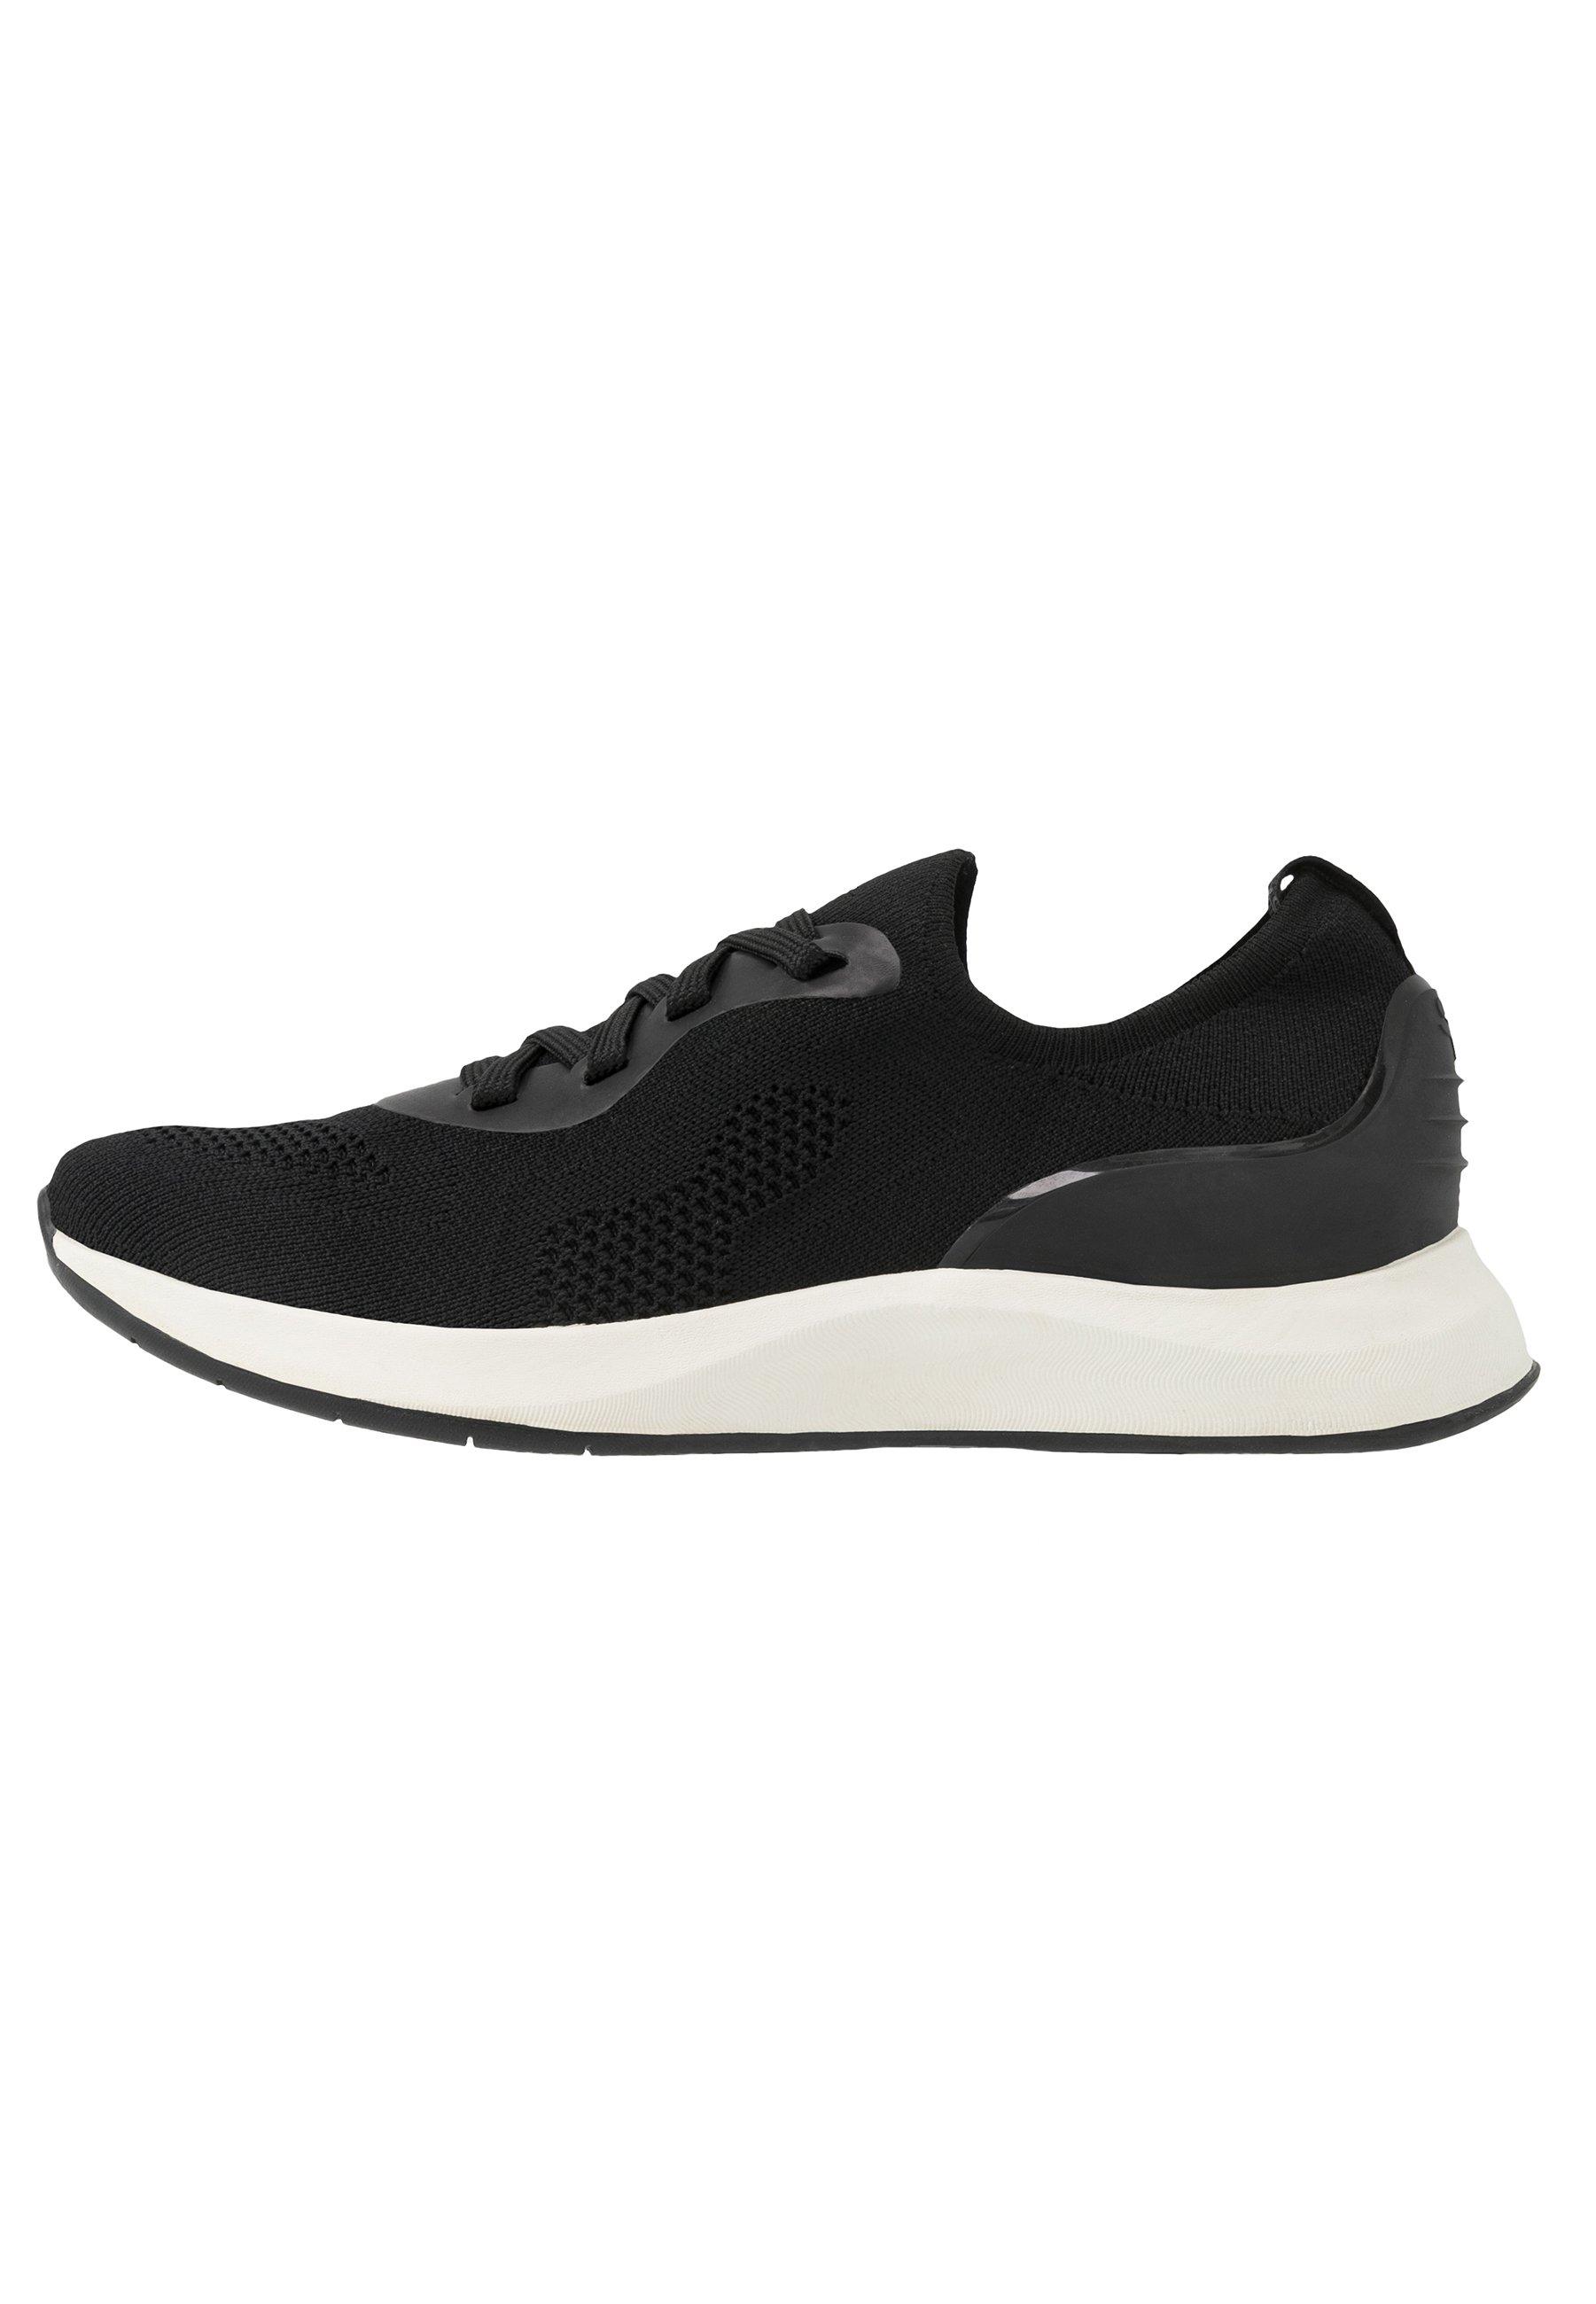 Tamaris Fashletics Sneakers Laag - Black Goedkope Schoenen